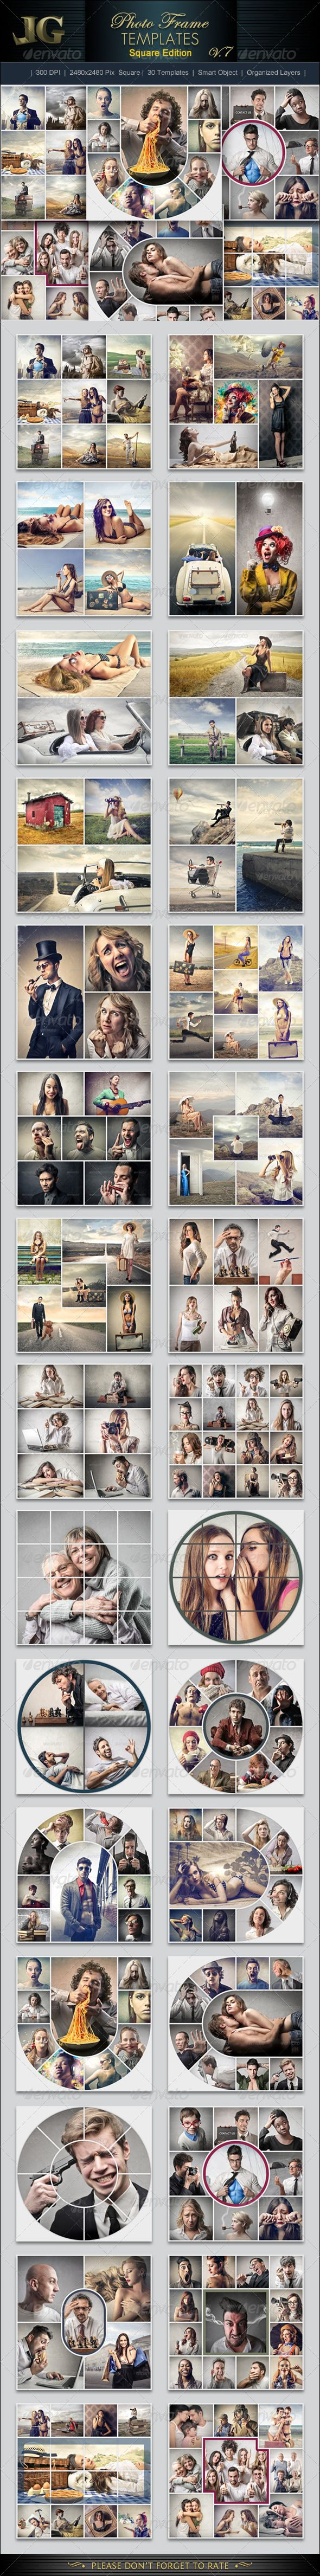 Photo Frame Templates V7 Square #design Download: http://graphicriver.net/item/photo-frame-templates-v7-square/7137367?ref=ksioks